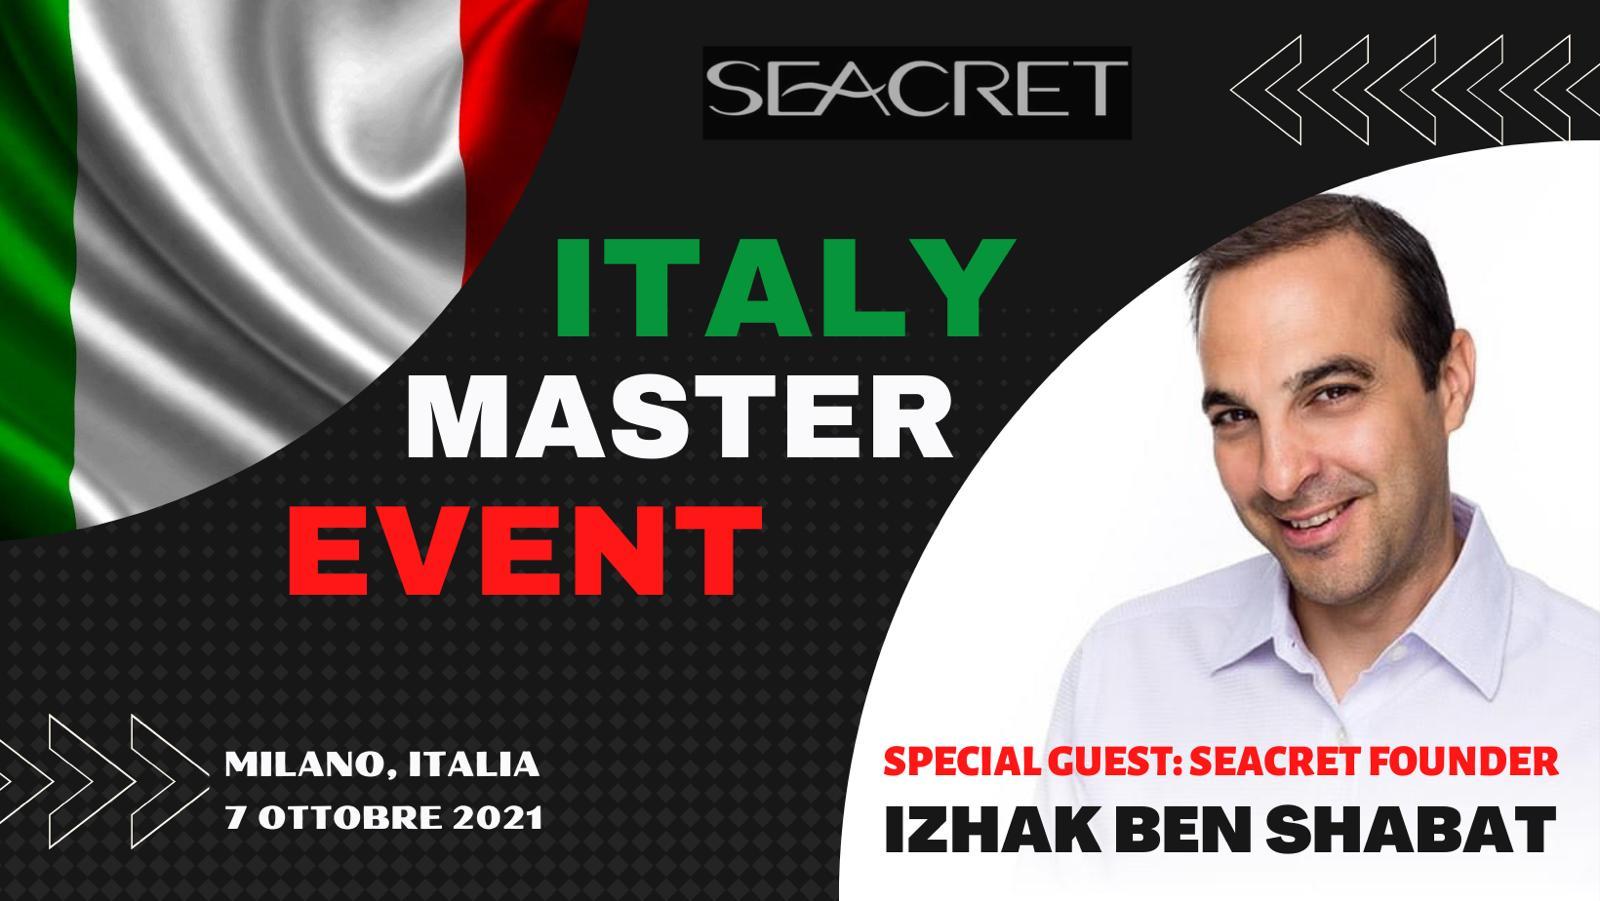 ITALY MASTER EVENT SPECIAL GUEST: SEACRET FOUNDER  - IZHAK BEN SHABAT